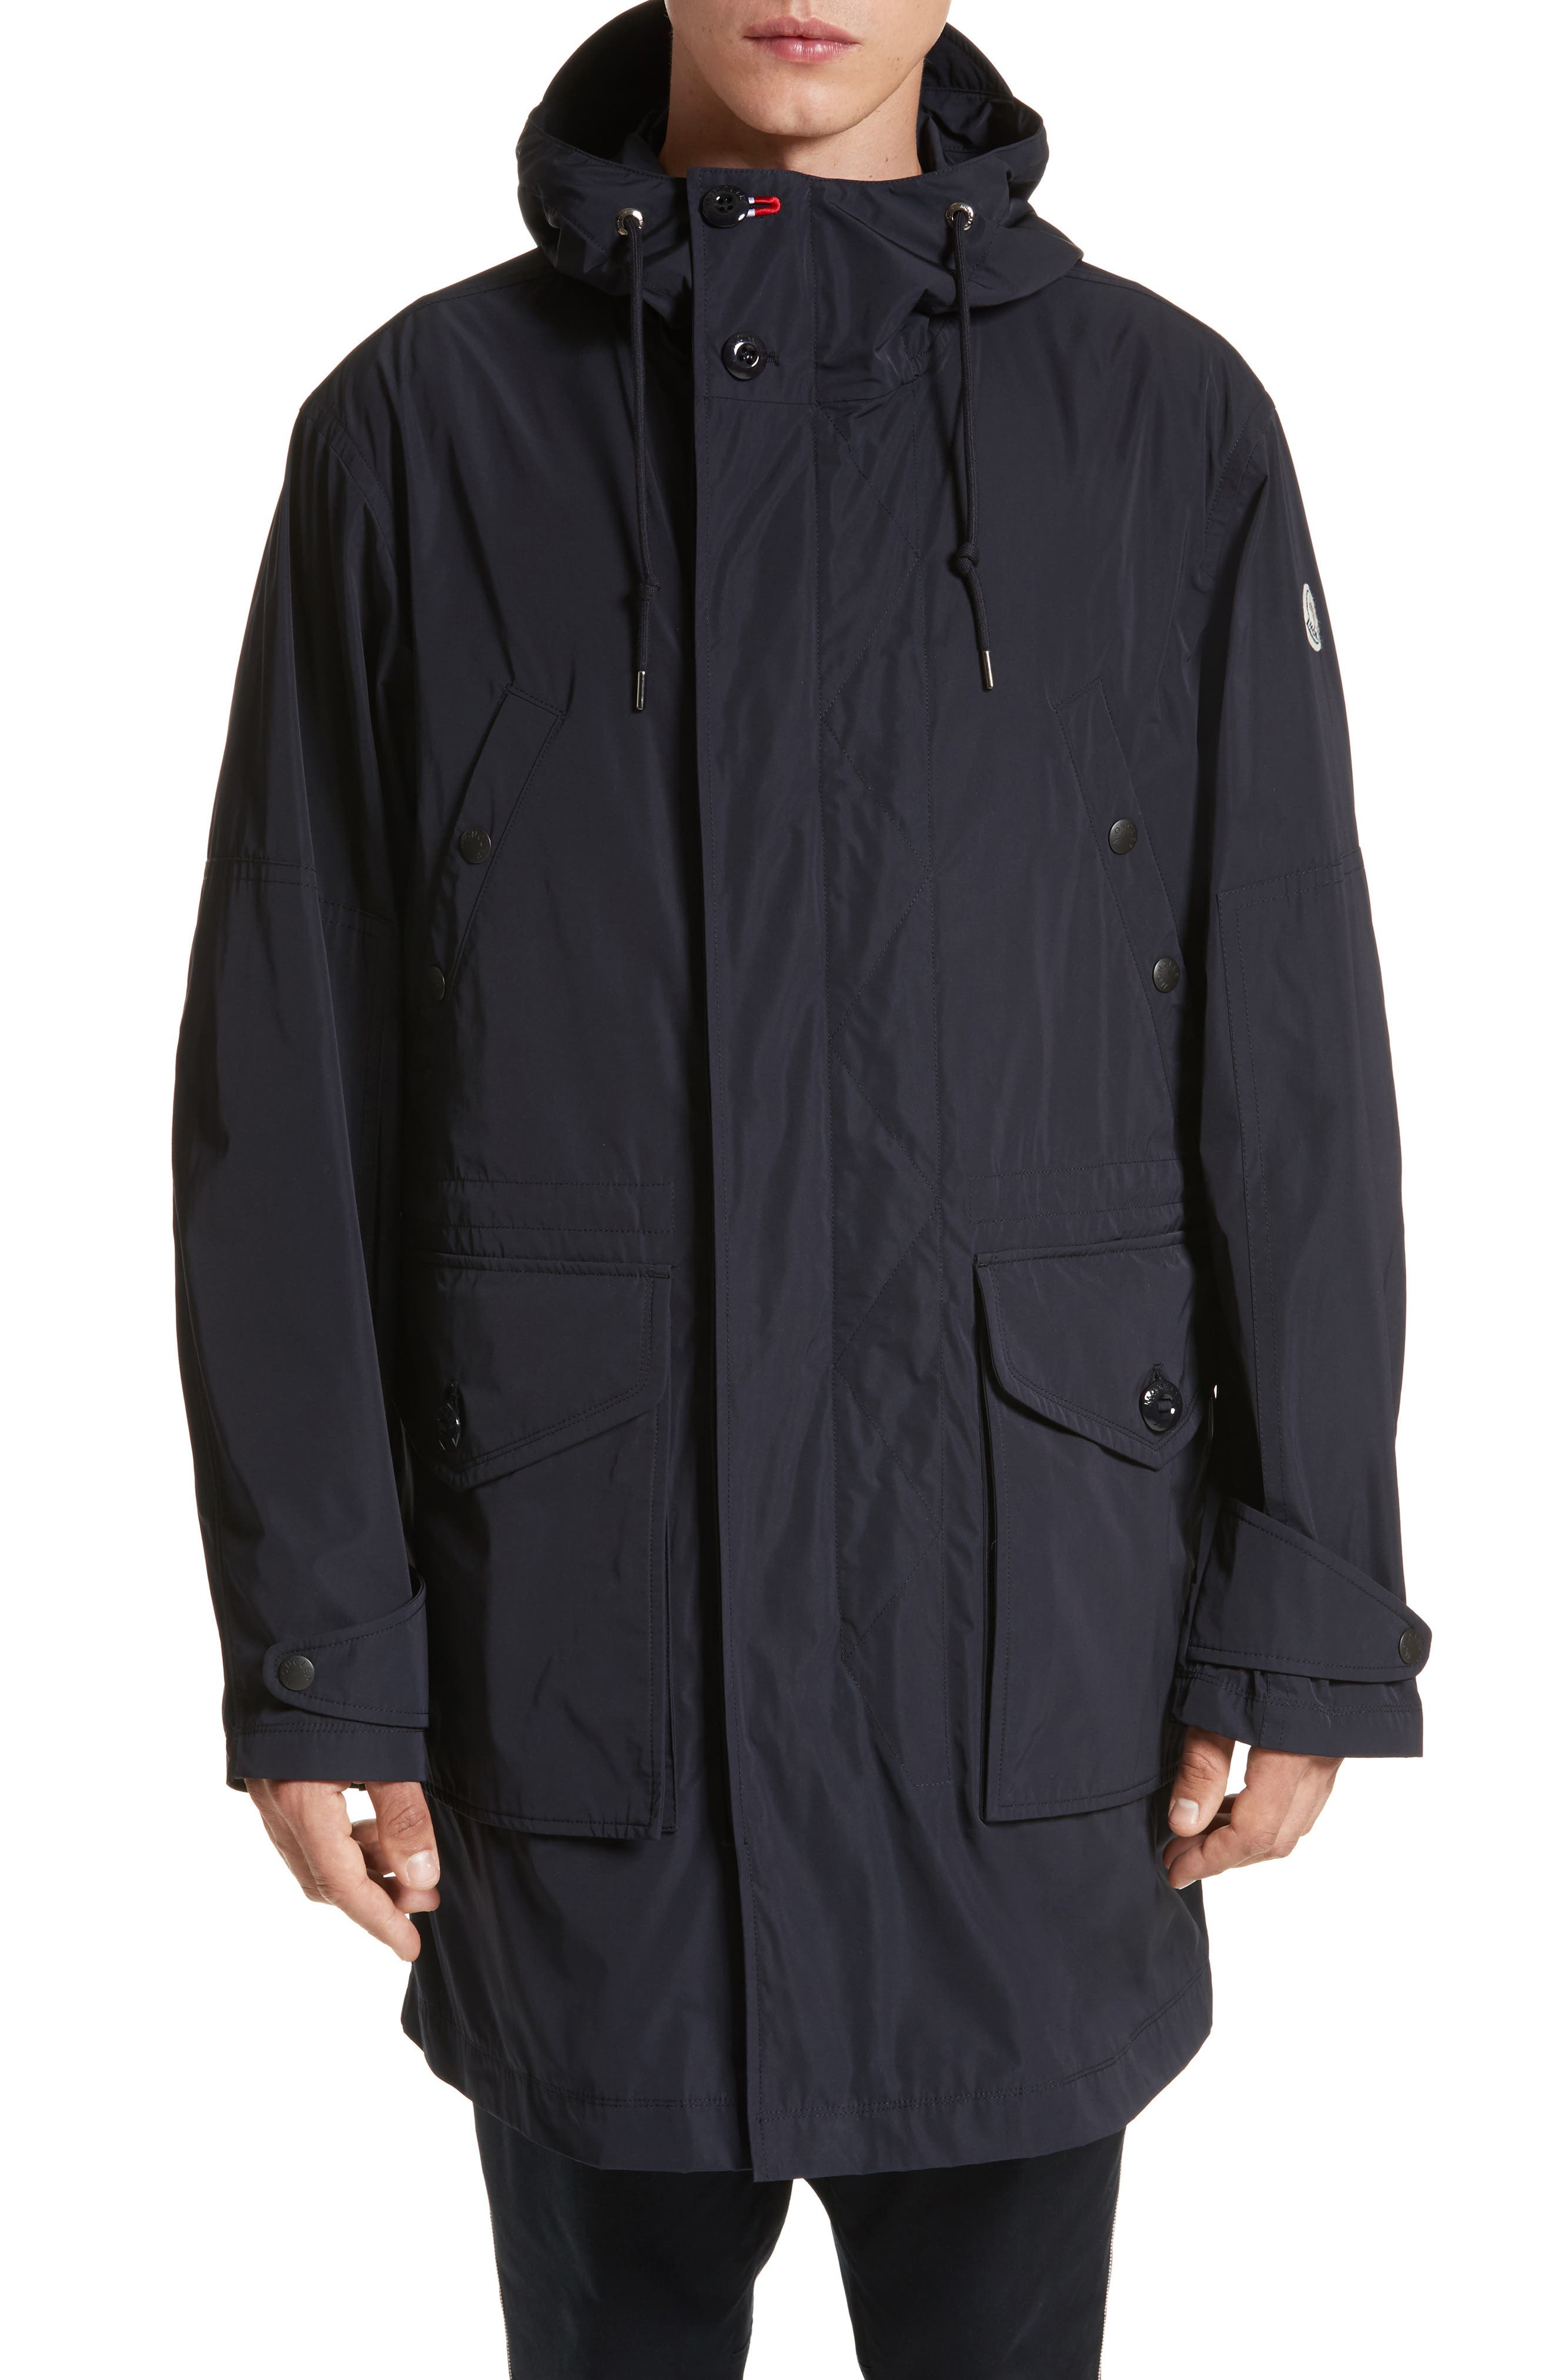 Guiers Long Raincoat,                             Main thumbnail 1, color,                             Navy